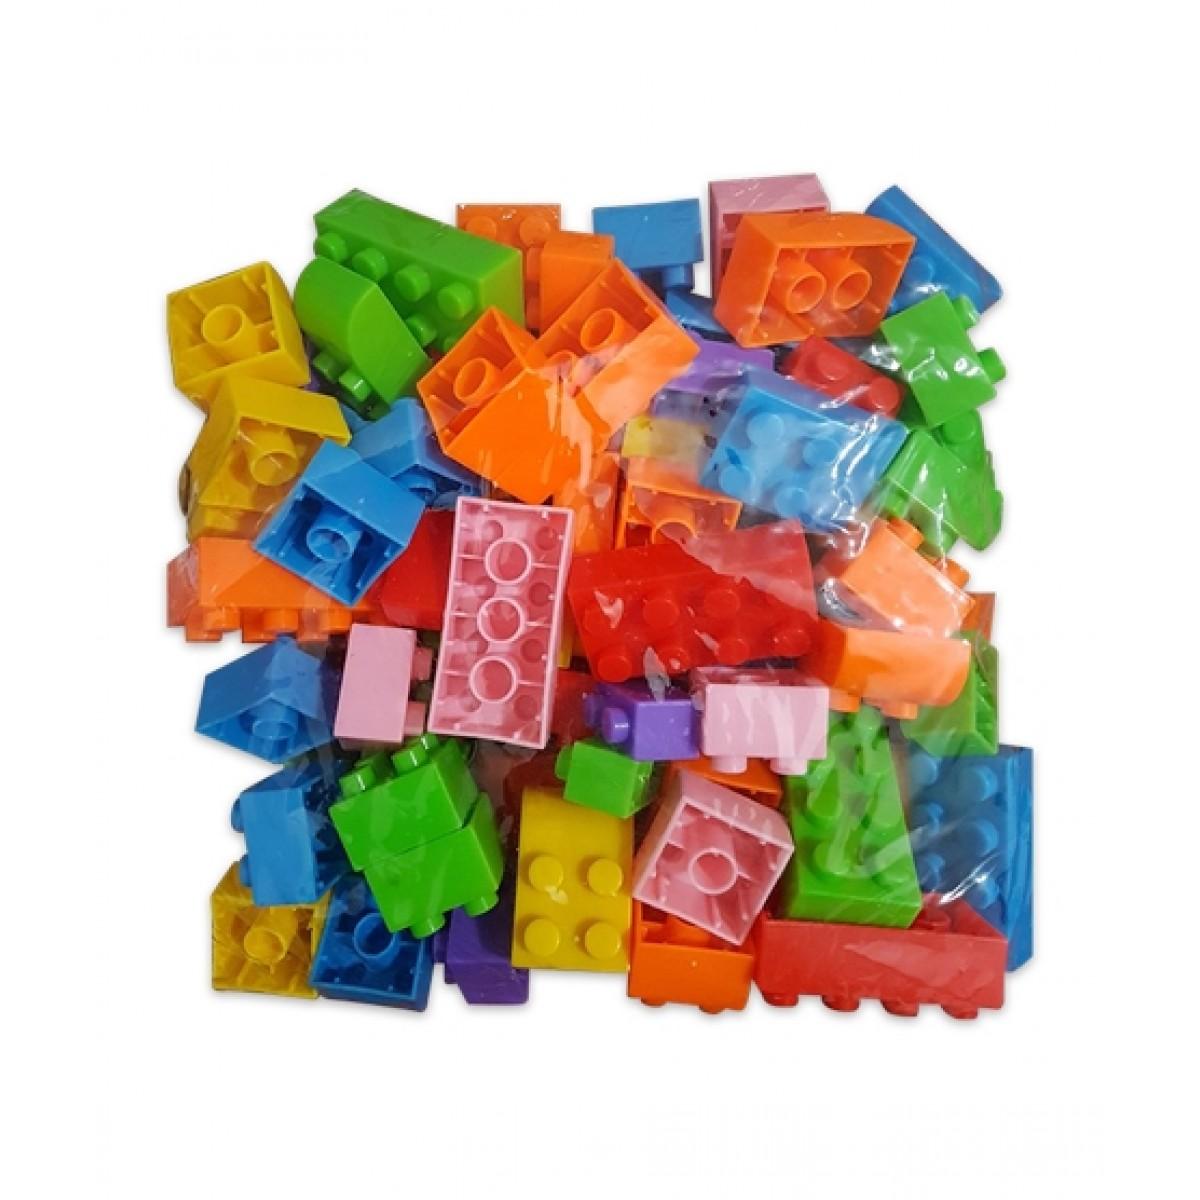 Fanci Mall Toy Bricks (TY002)